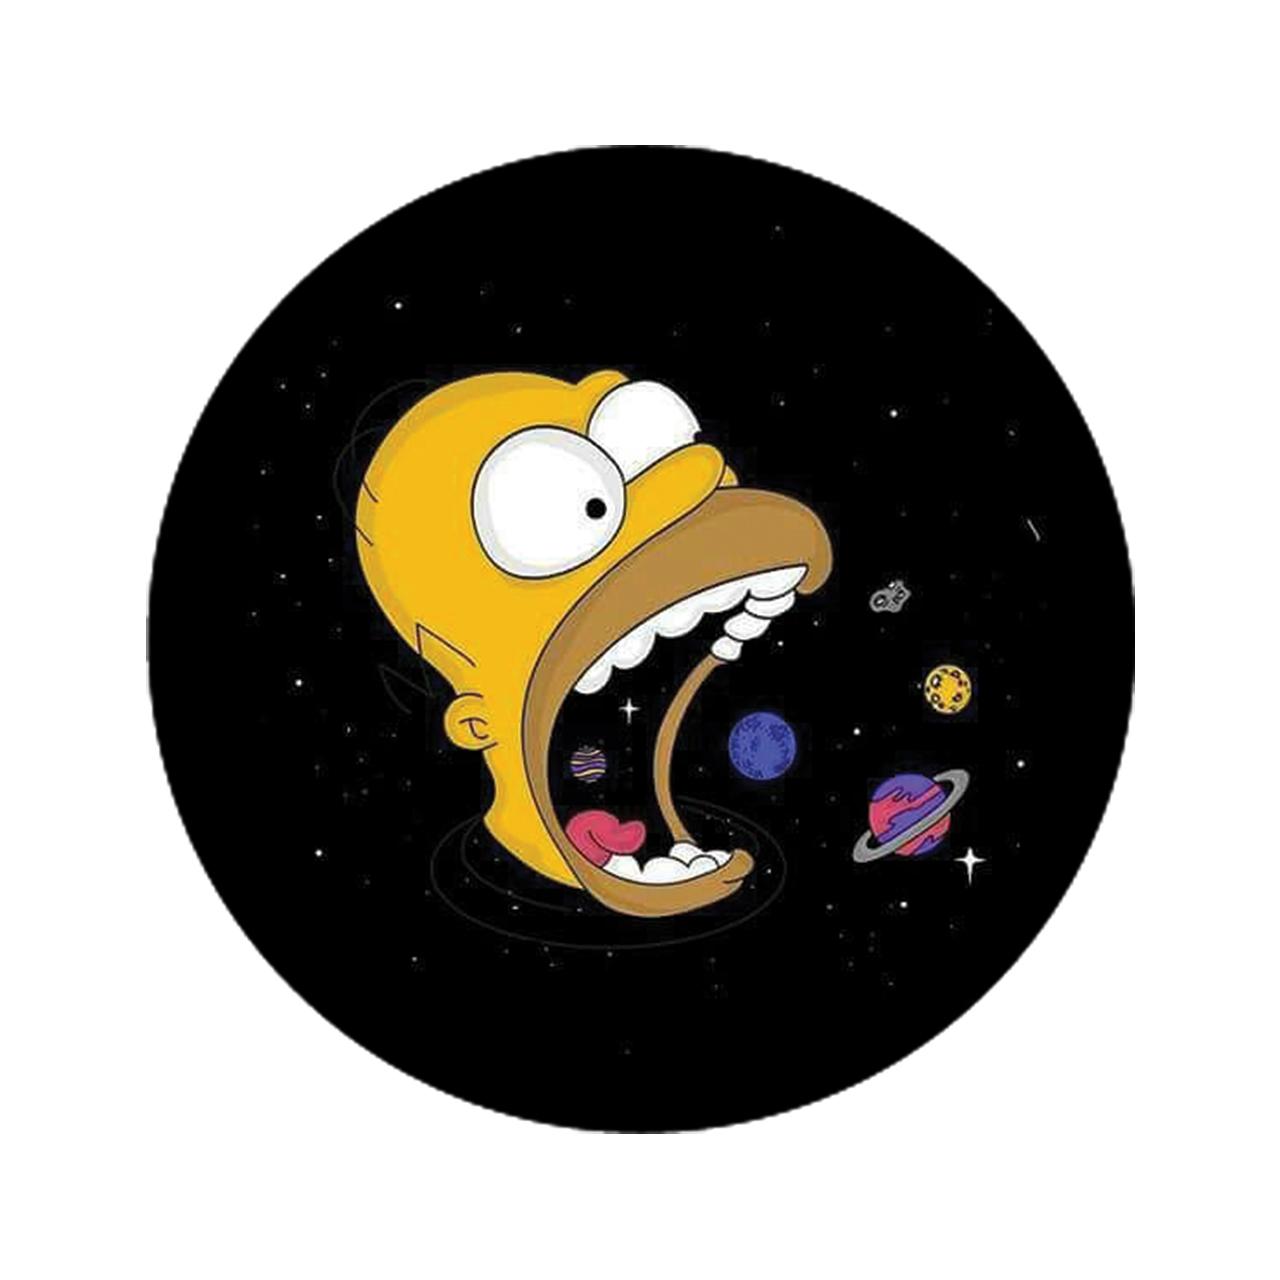 پیکسل مدل سیمپسون کد 446